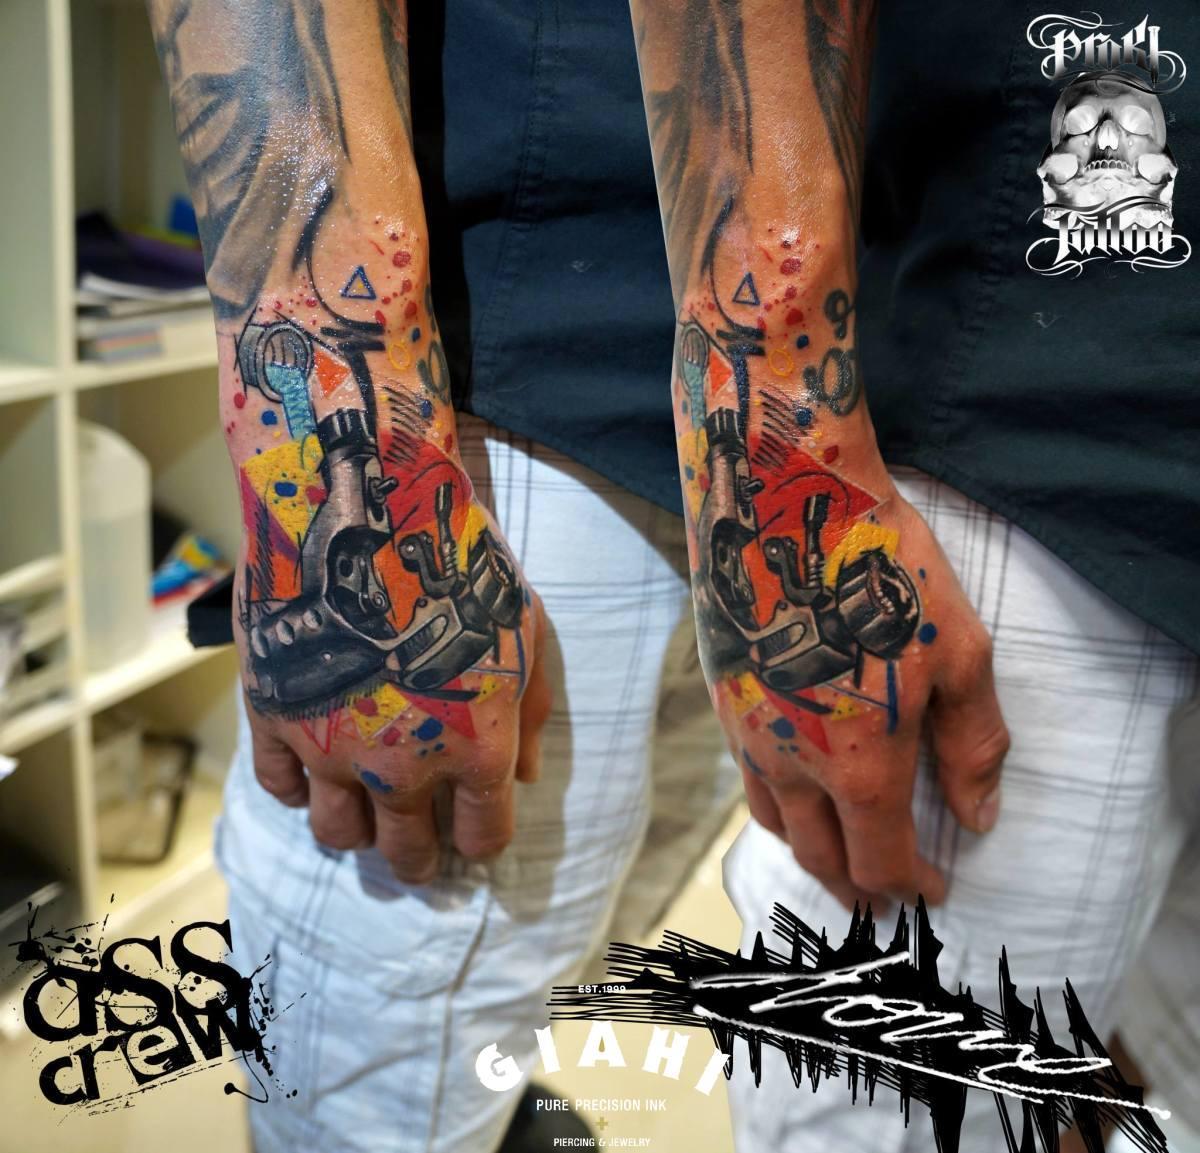 Unloaded Tattoo Machine tattoo by George Drone